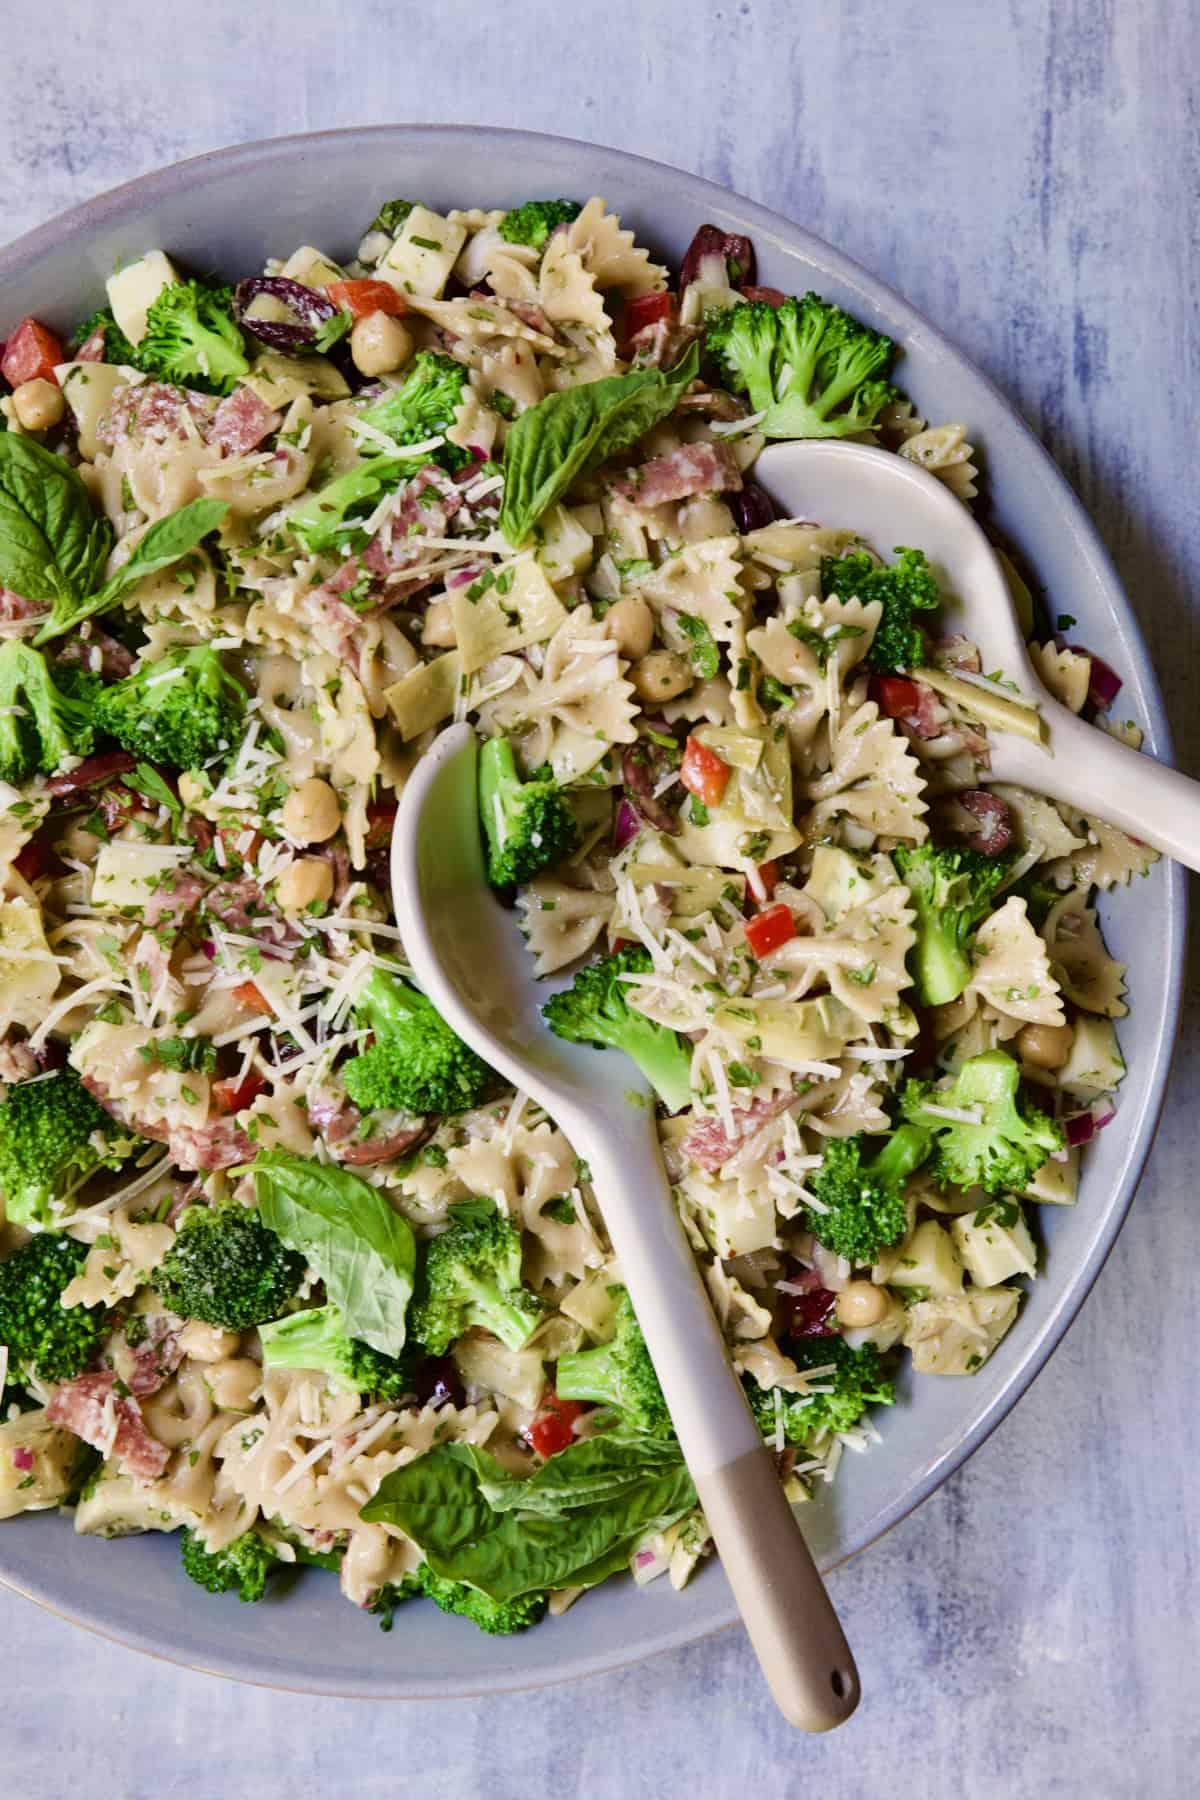 Antipasto Pasta Salad with Parmesan Herb Vinaigrette garnished with fresh basil.